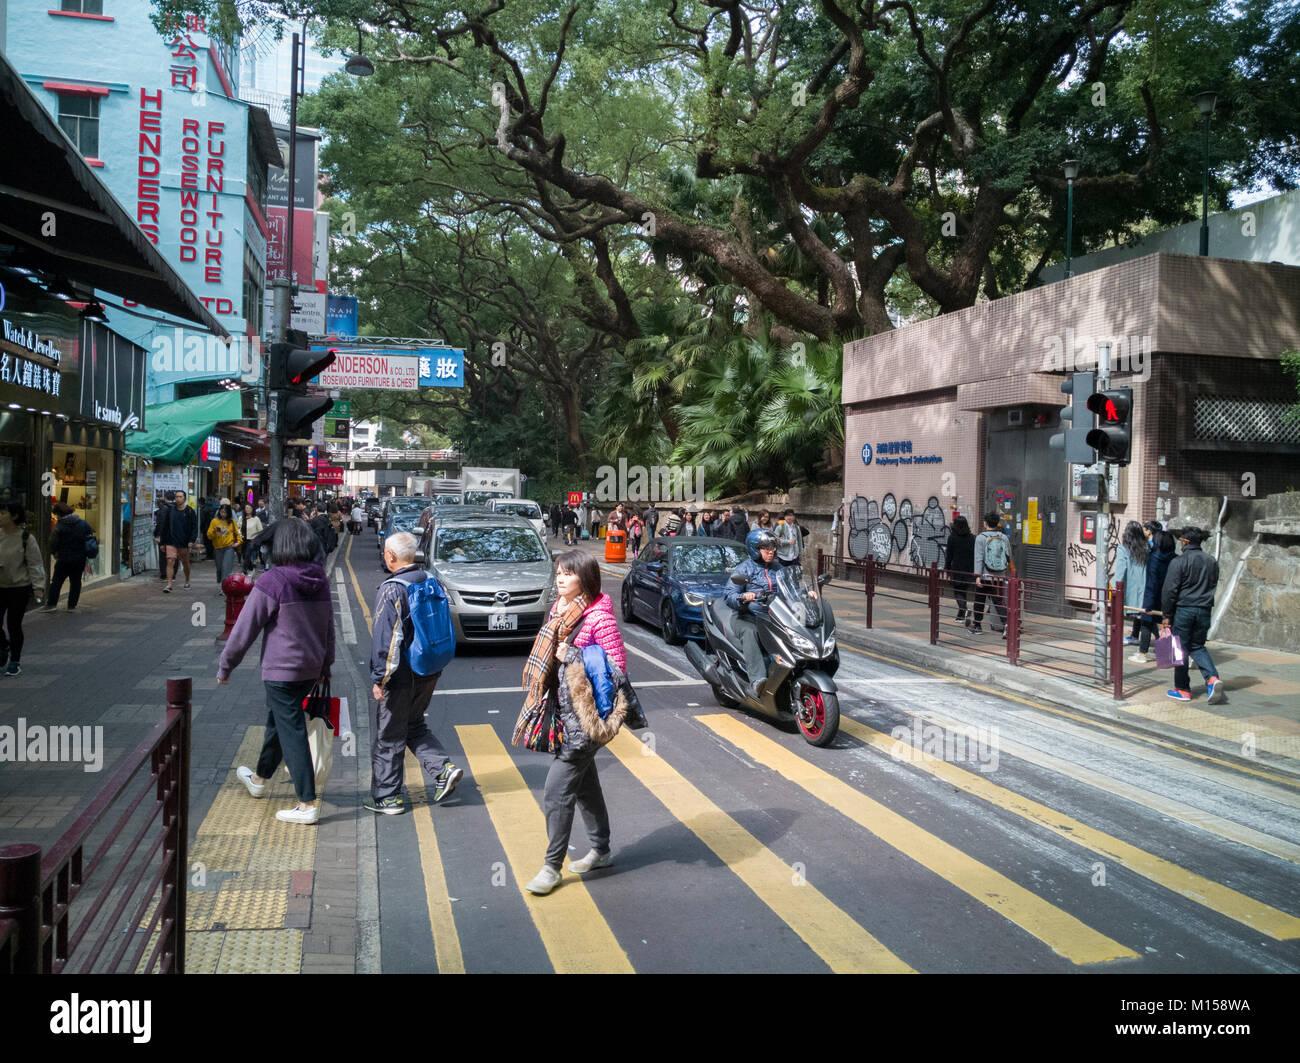 Pedestrians in Tsim Sha Tsui, Kowloon, Hong Kong - Stock Image